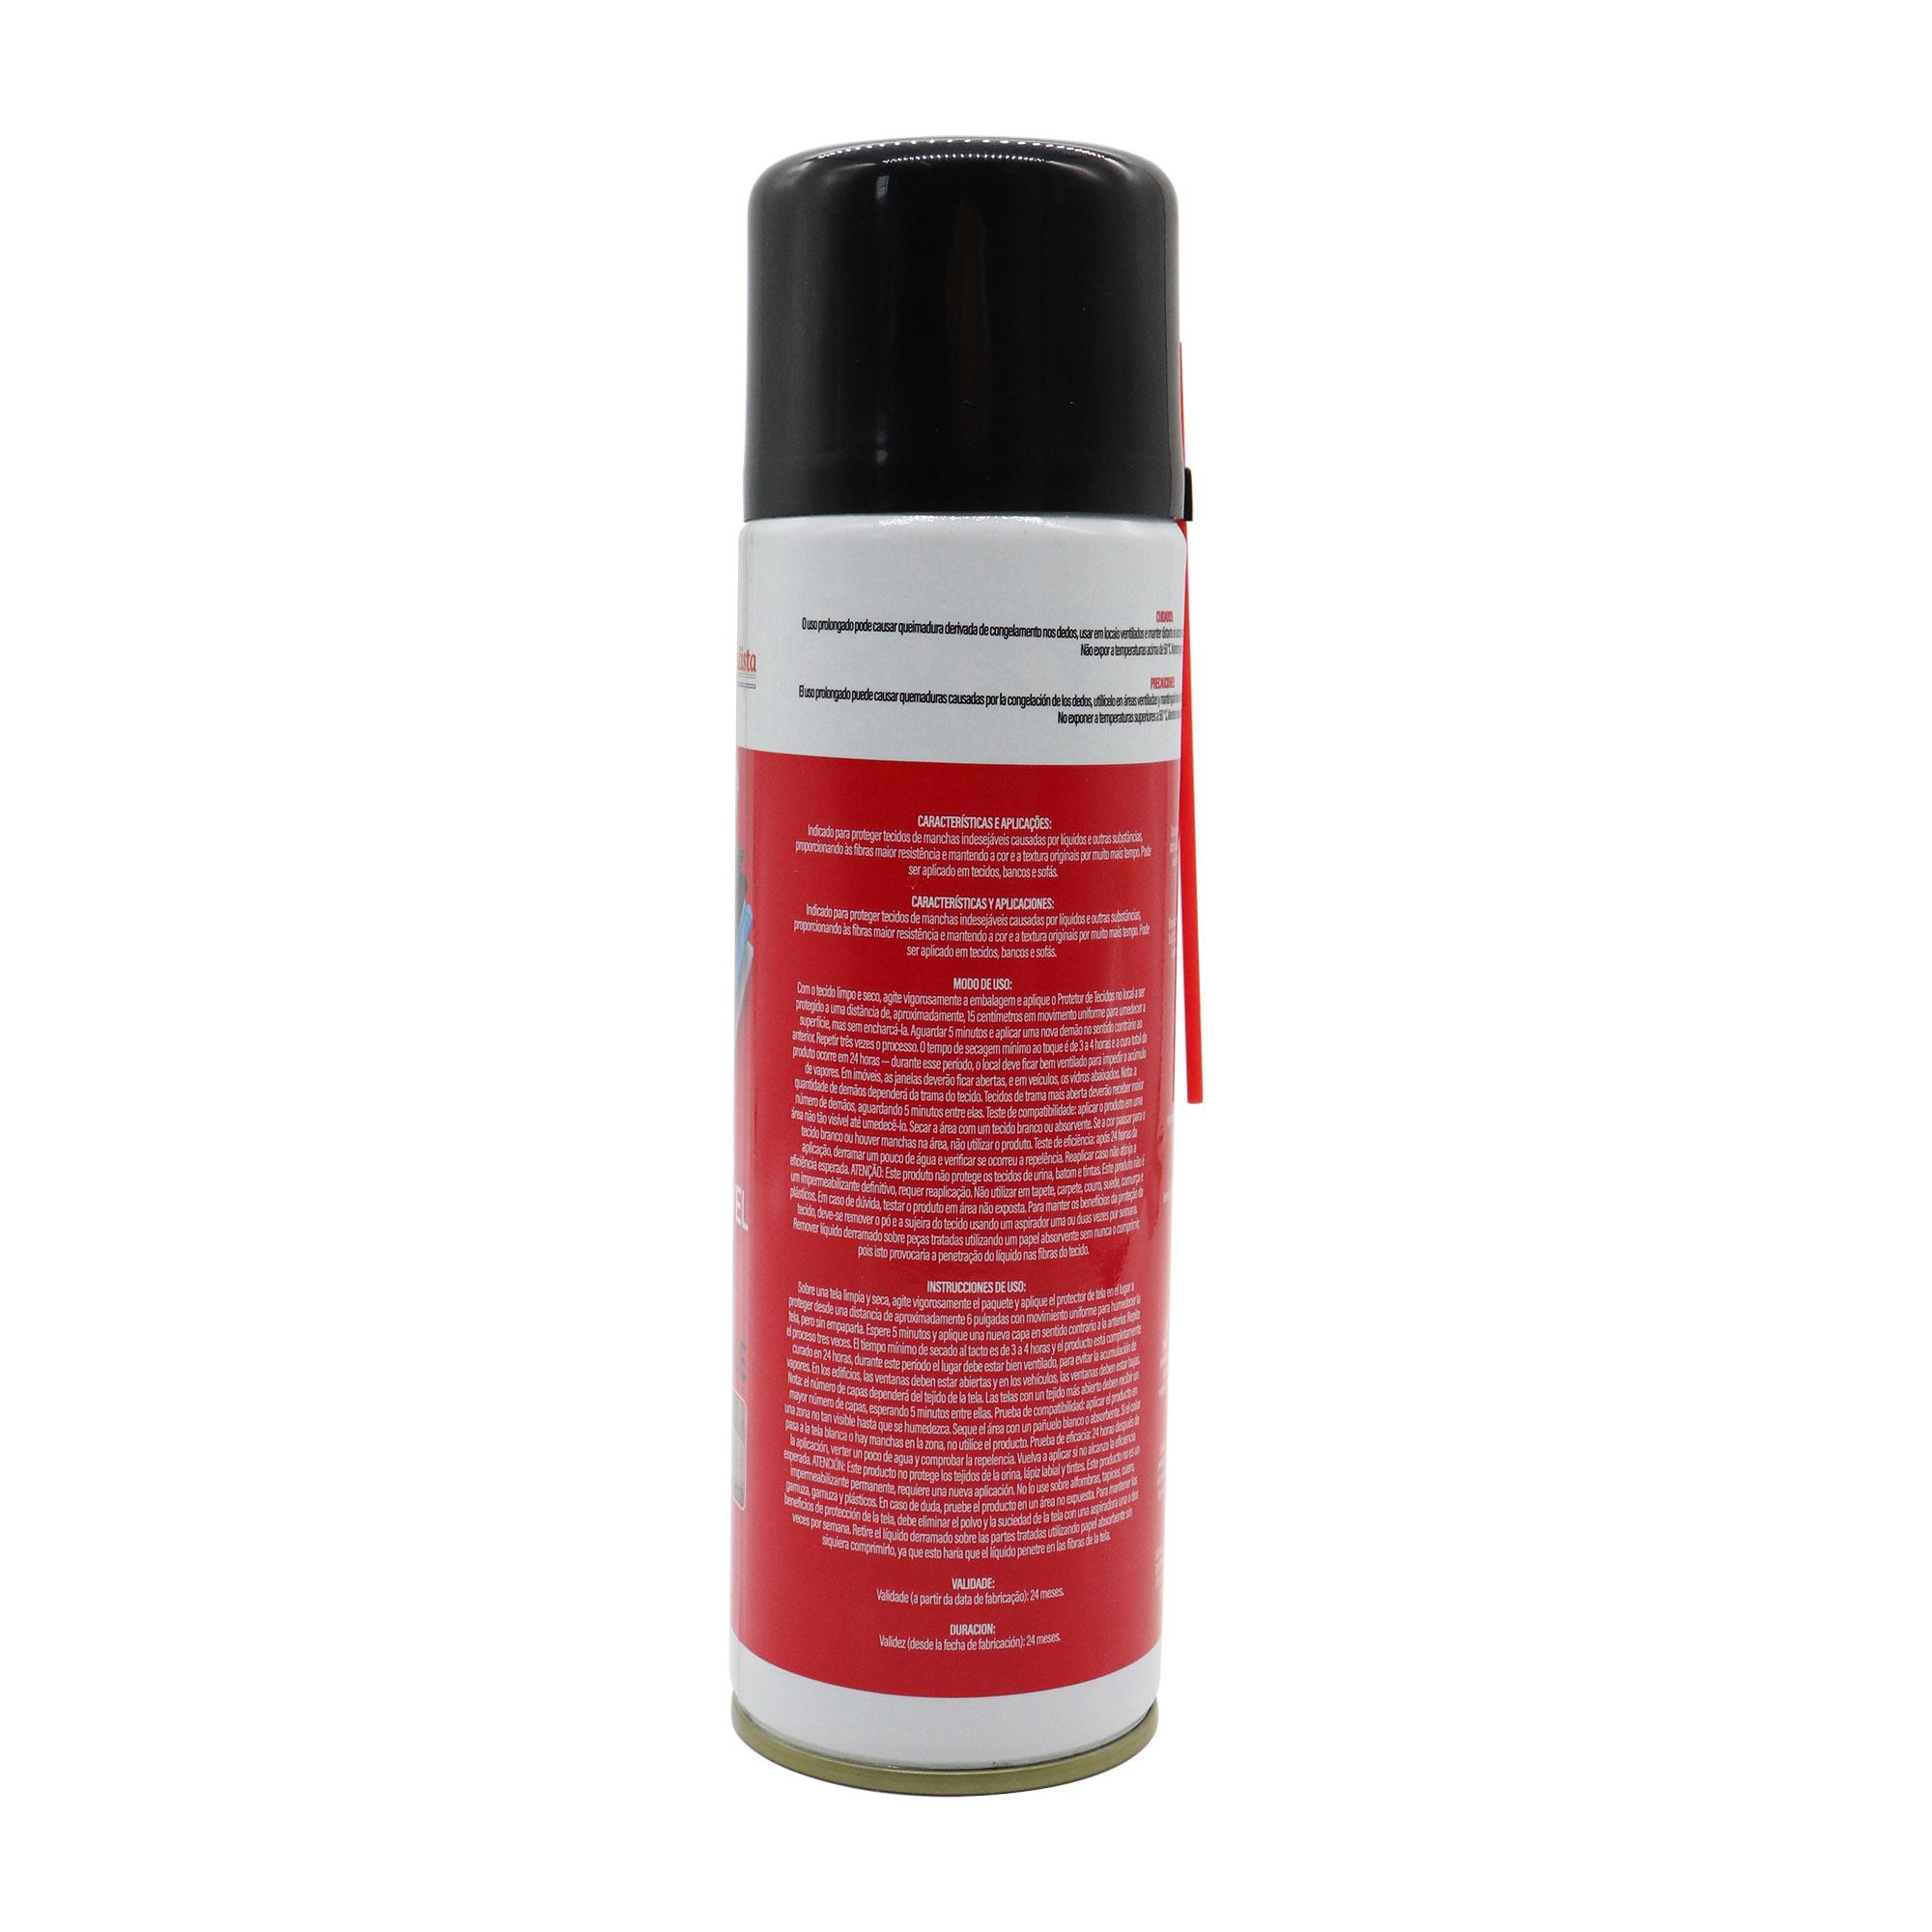 Spray Protetor Impermeável para Tecidos 300ml